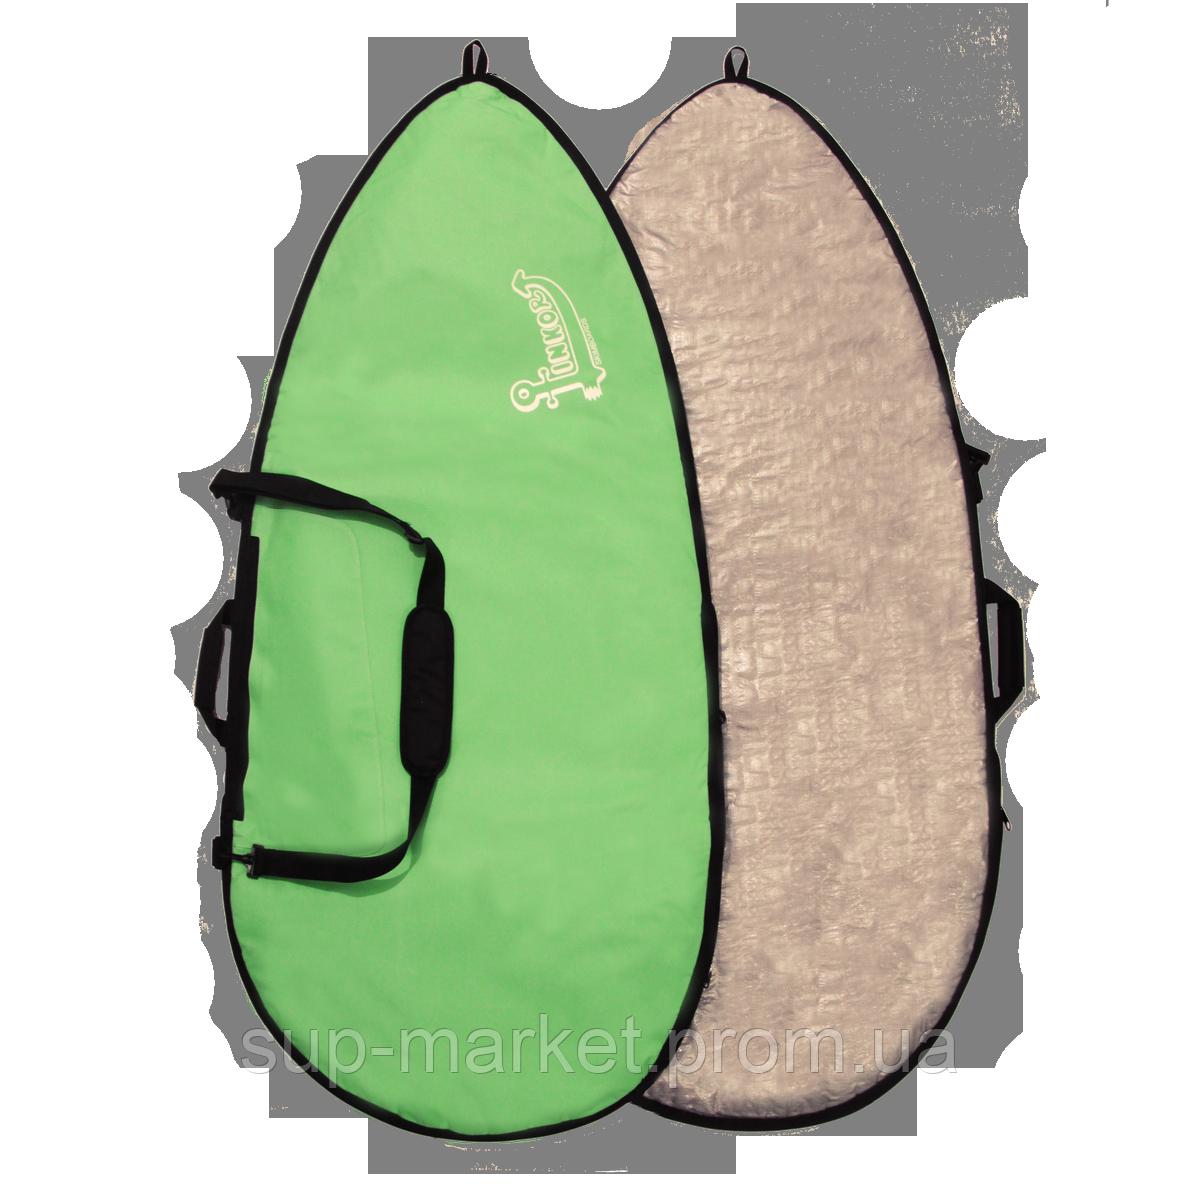 Чехол для вейксёрфа Linkorskimboards Wakesurf Pro Bag, 160 x 70cm, green